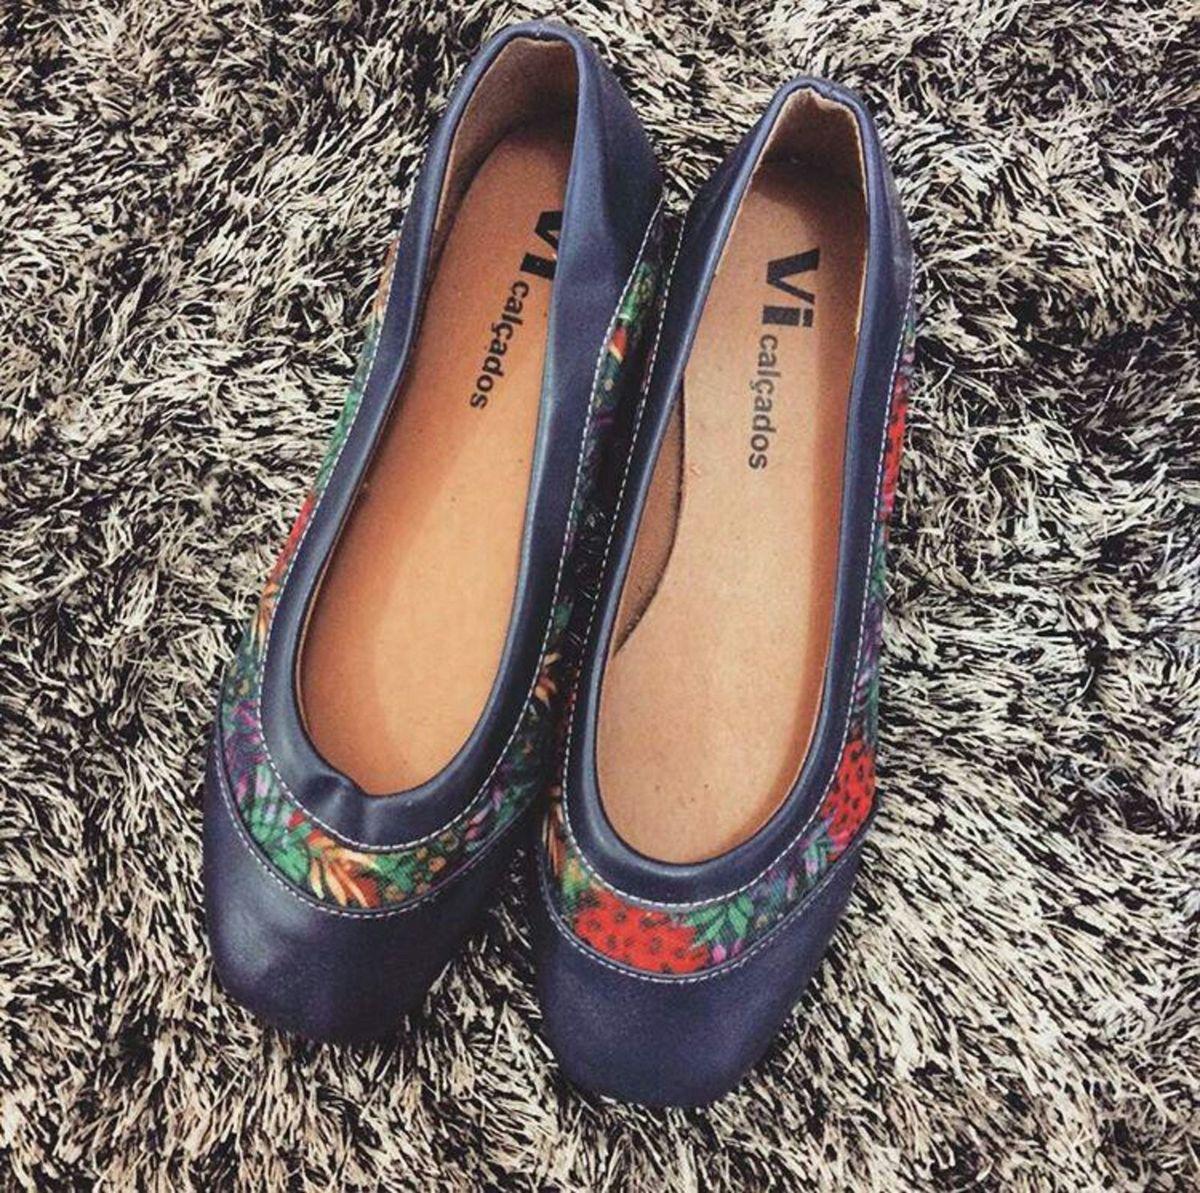 c46724576 sapatilha lindinha - sapatilha vi calçados.  Czm6ly9wag90b3muzw5qb2vplmnvbs5ici9wcm9kdwn0cy81mdq0njezlzbjzgflodhlmzy2y2y3mwy0mtljywy5ywqxm2fjotvilmpwzw